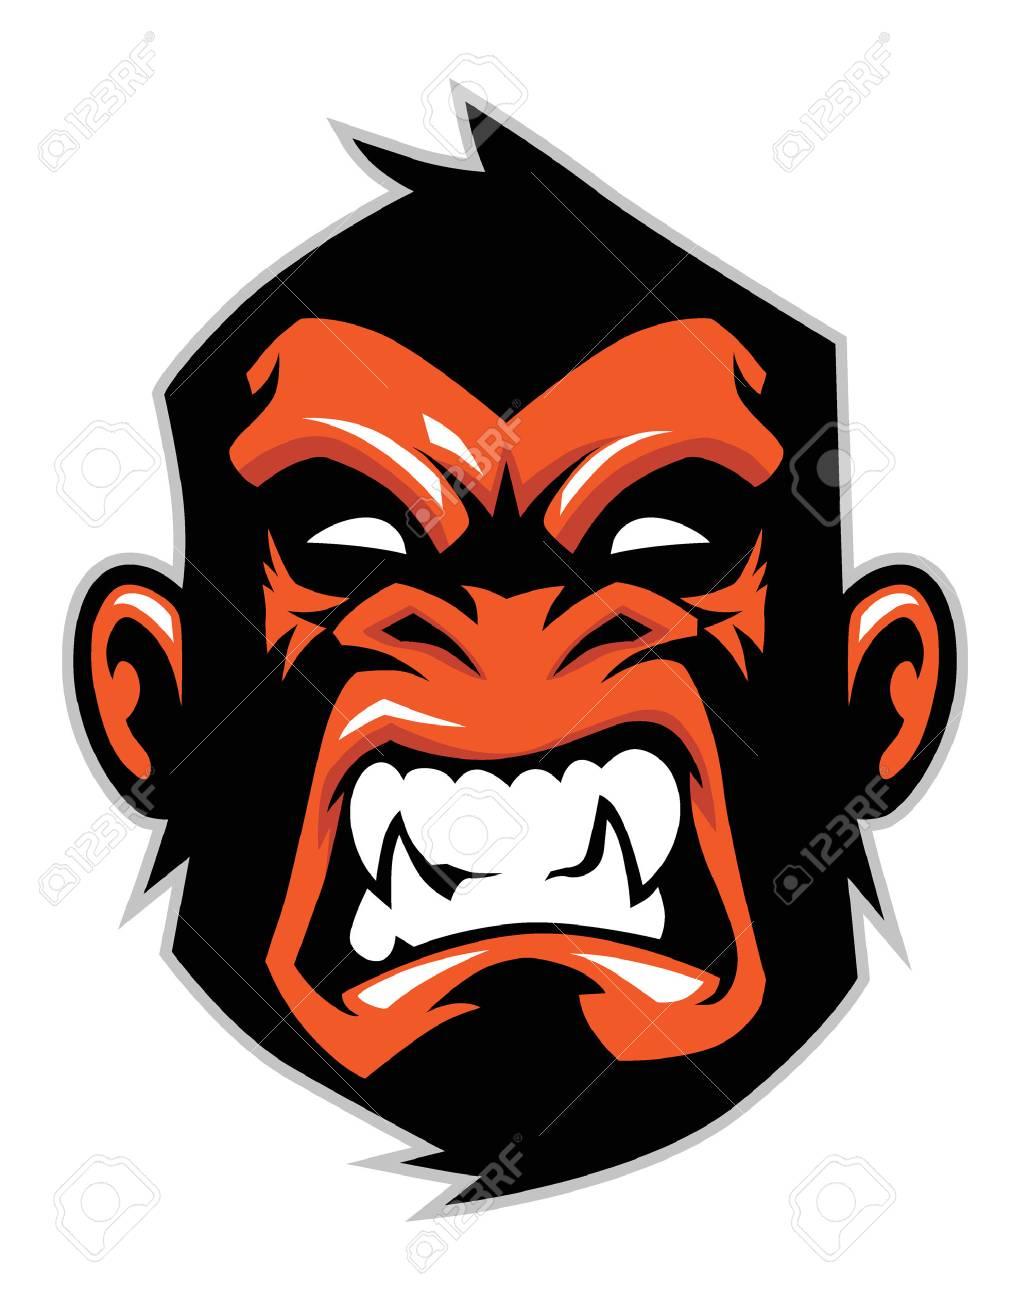 angry monkey head Vector illustration. - 91884604